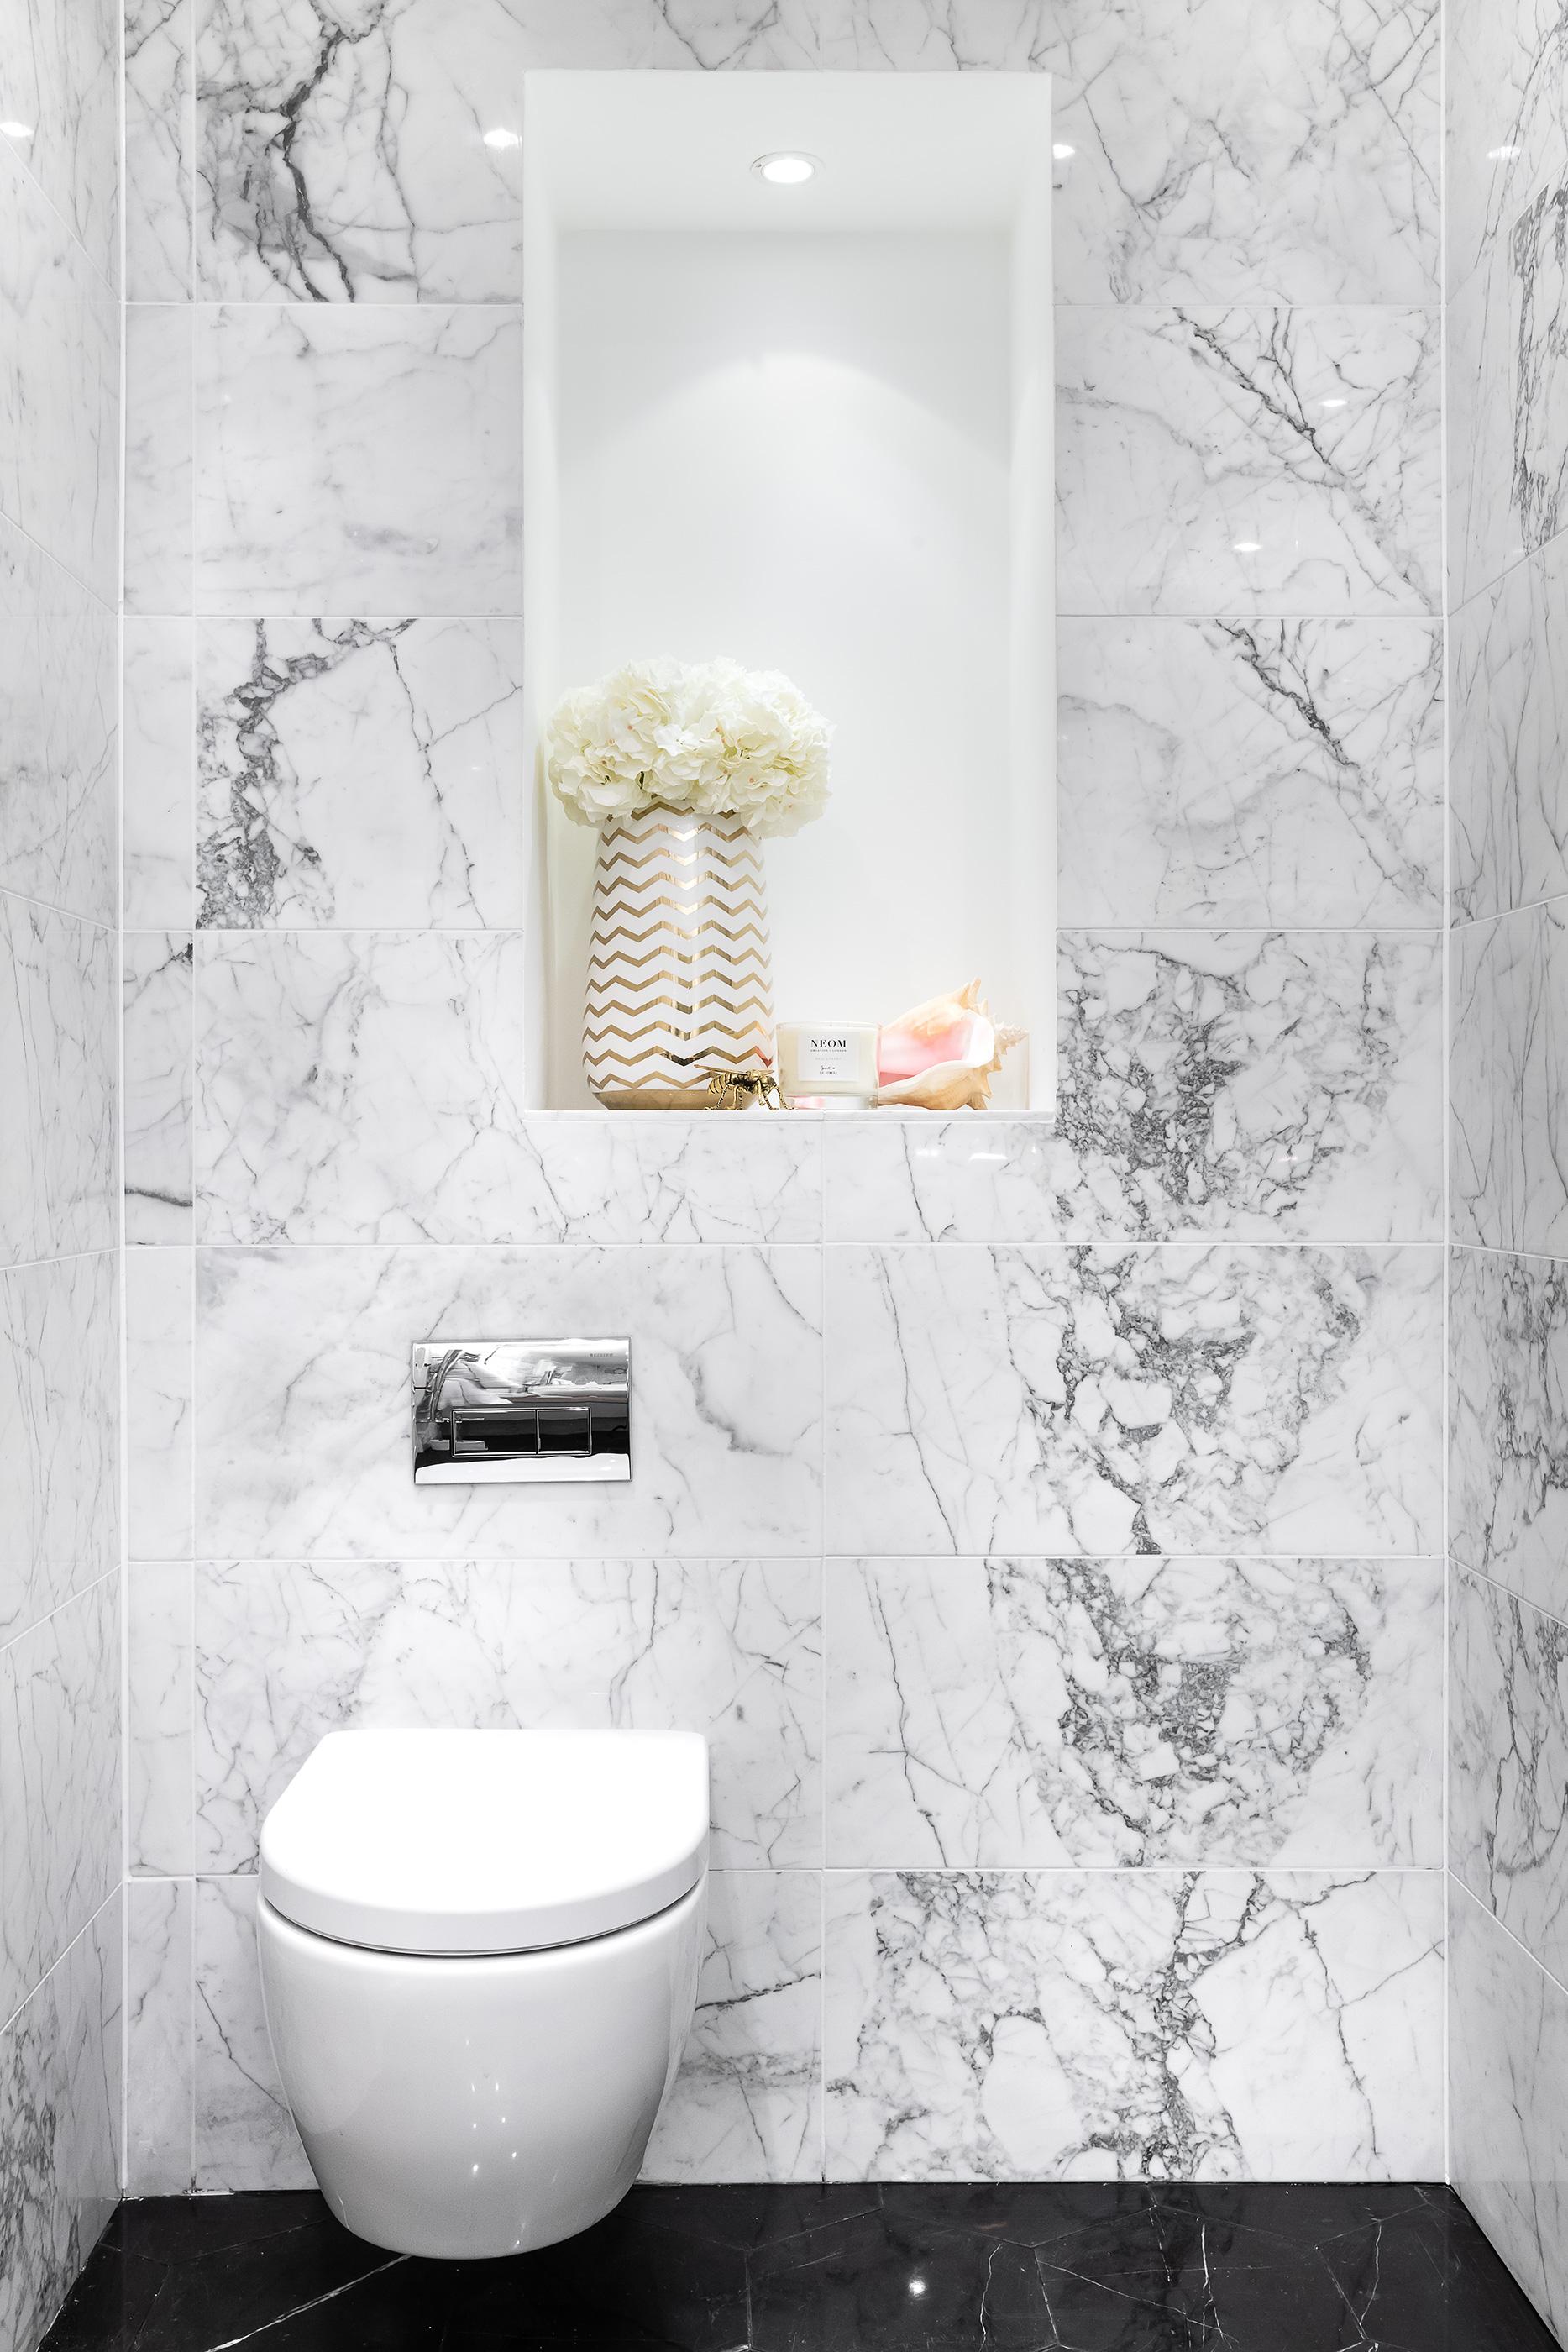 Bathroom_VR_02.jpg